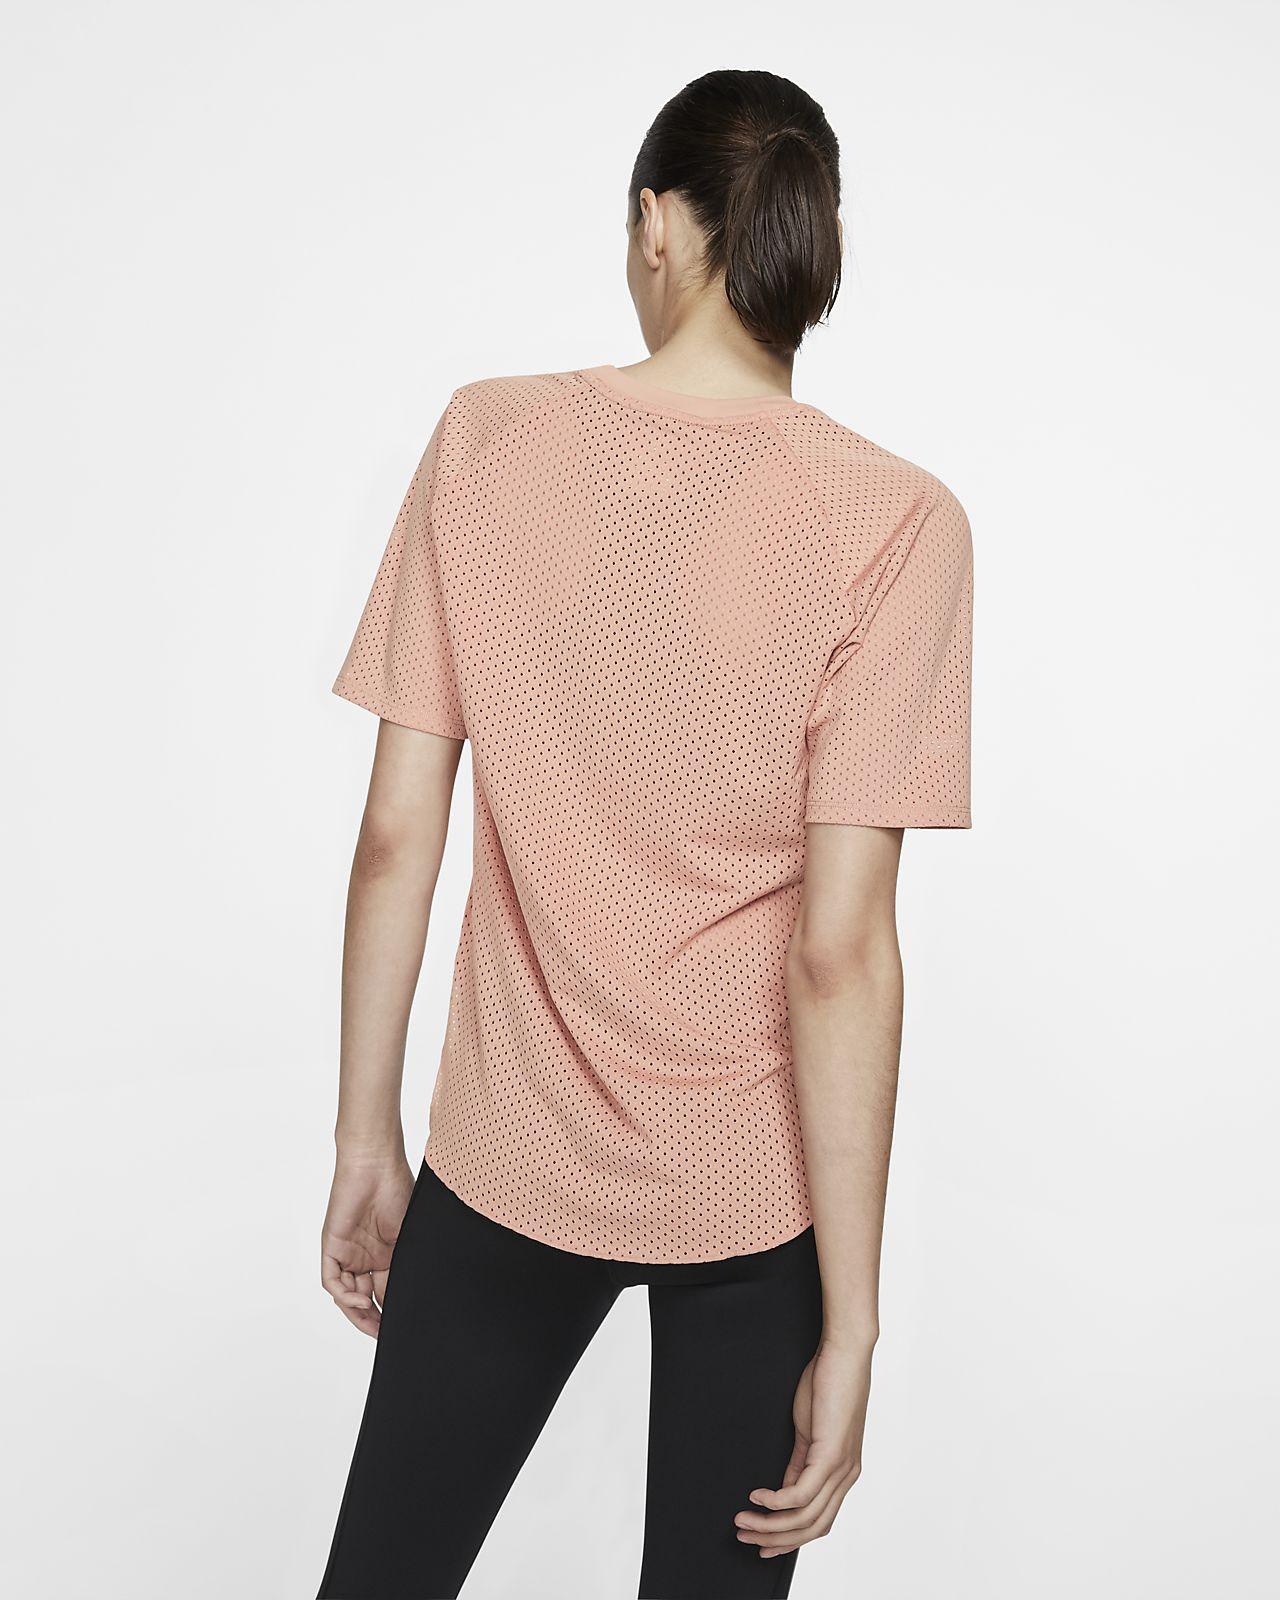 lowest price fabfa 0c044 ... Nike City Sleek Women s Short-Sleeve Running Top